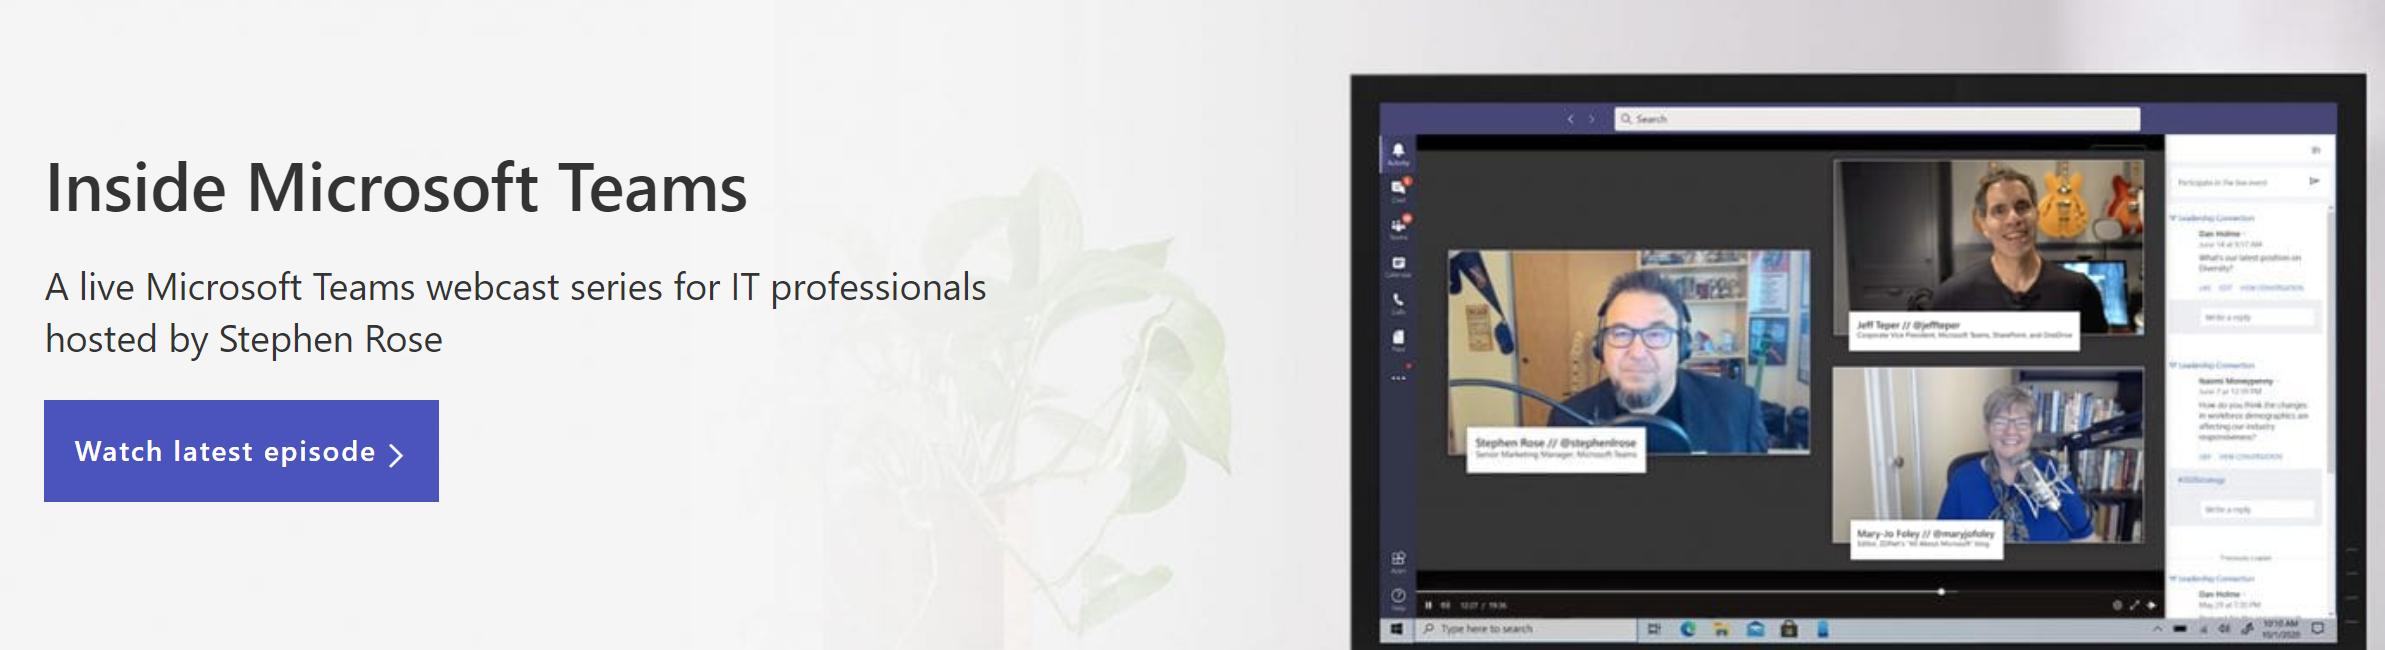 Inside Microsoft Teams webcast teaser